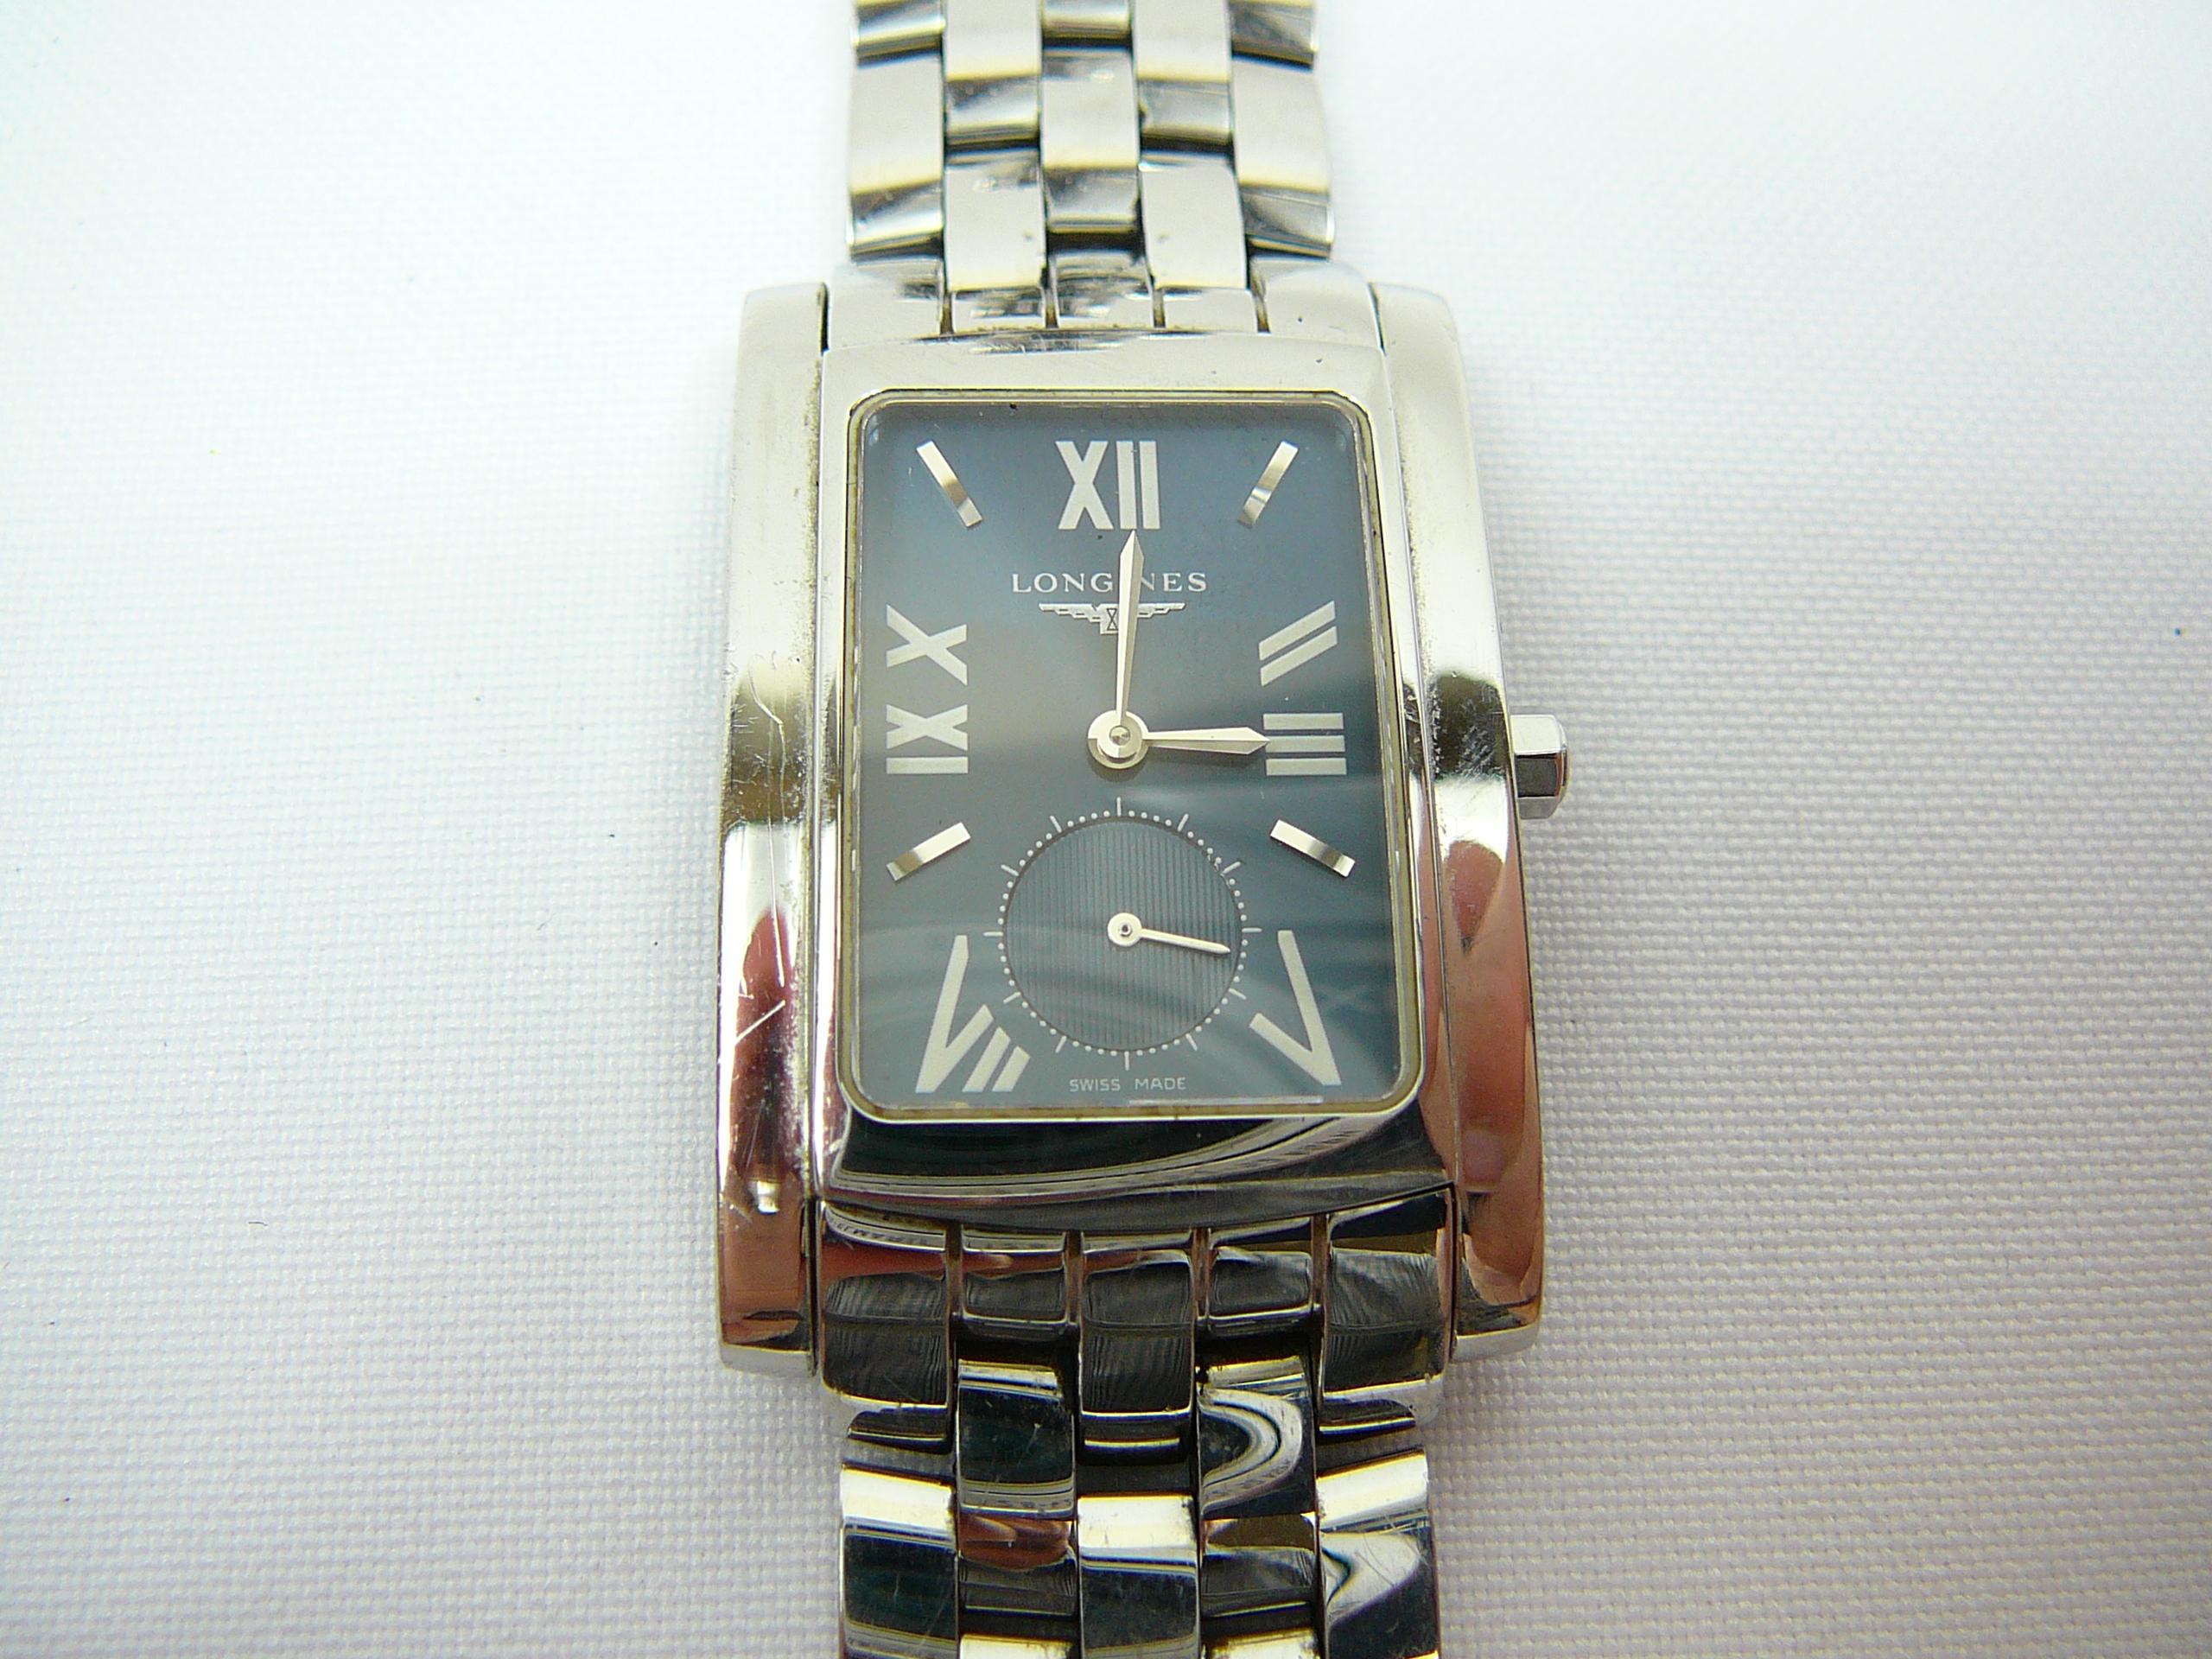 Lot 4 - Gents Longines wrist watch